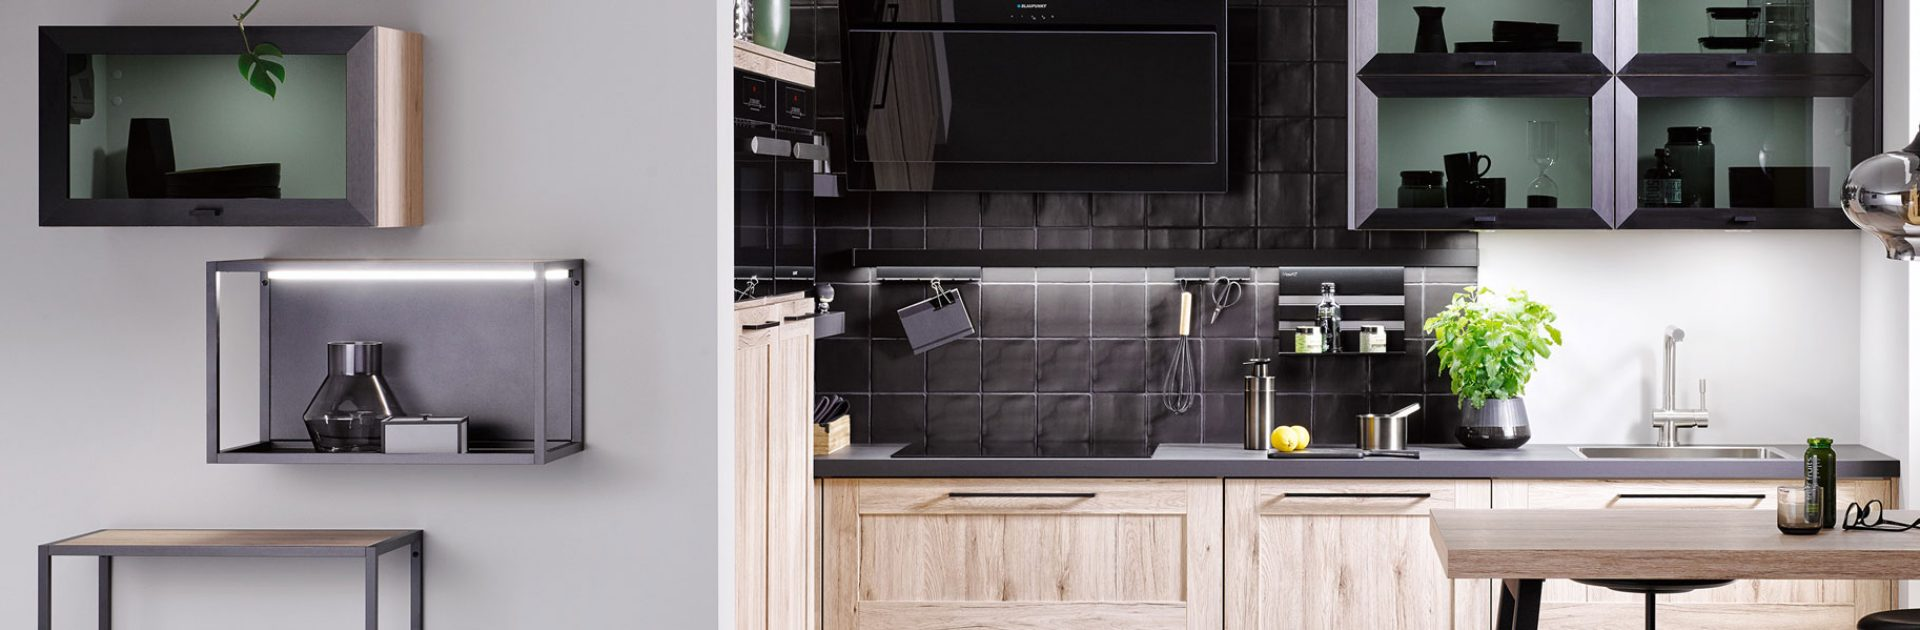 Unieke keukens klassieke stijl | Eigenhuis Keukens